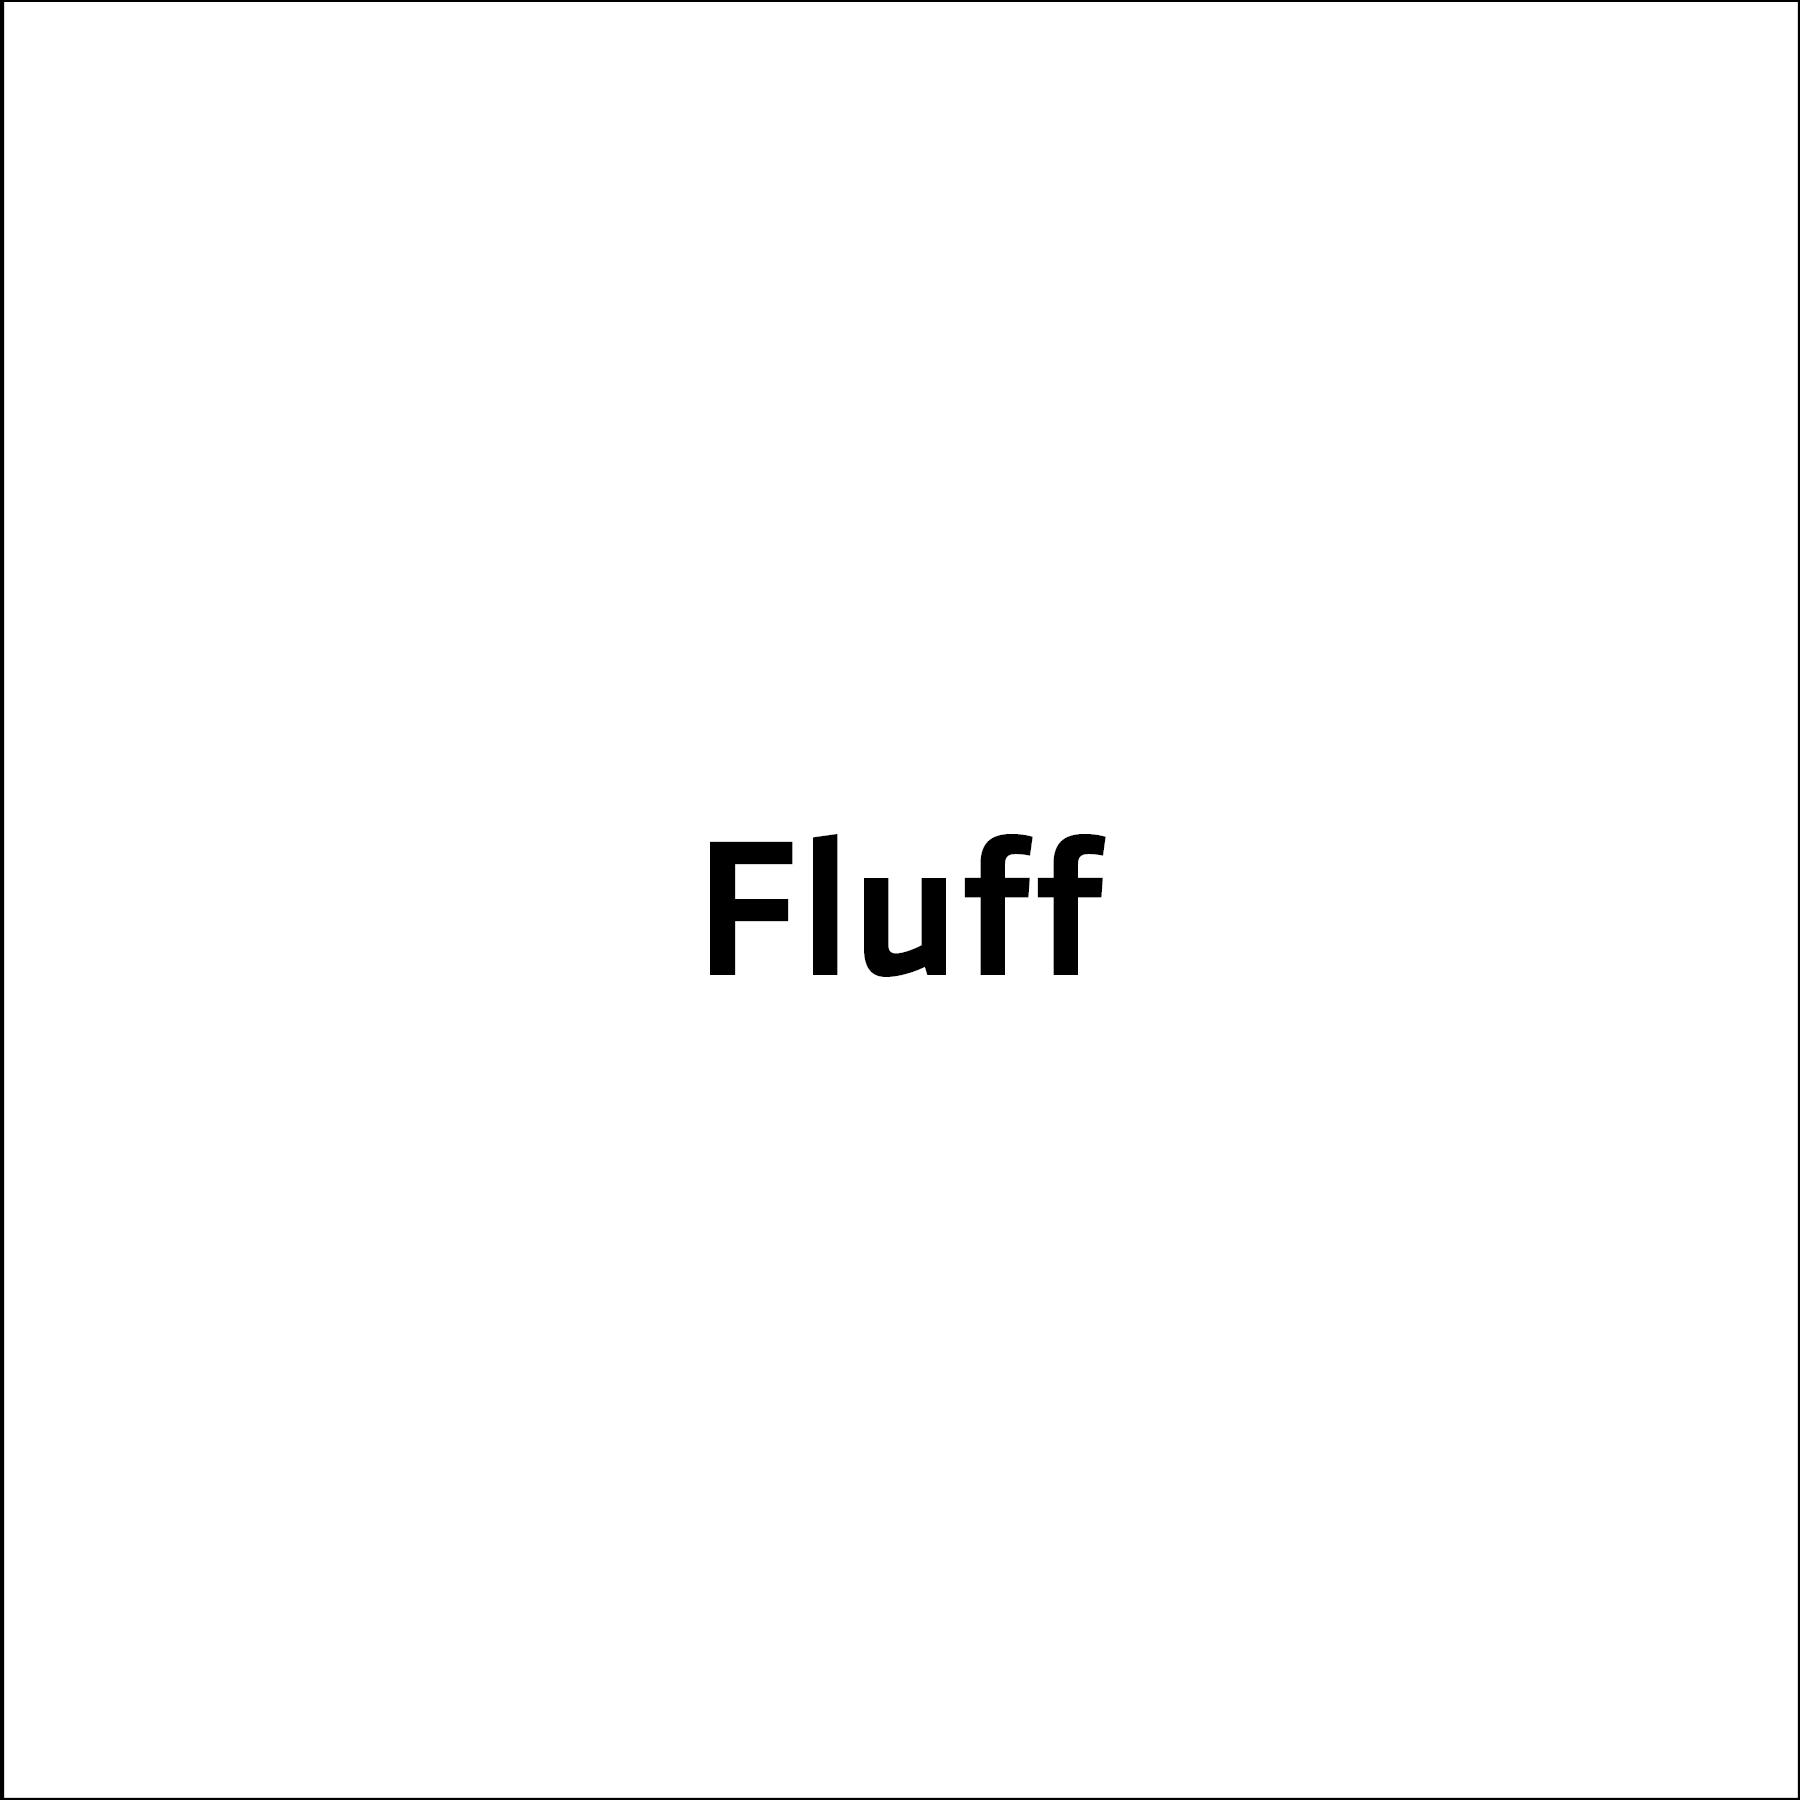 riff words8.jpg